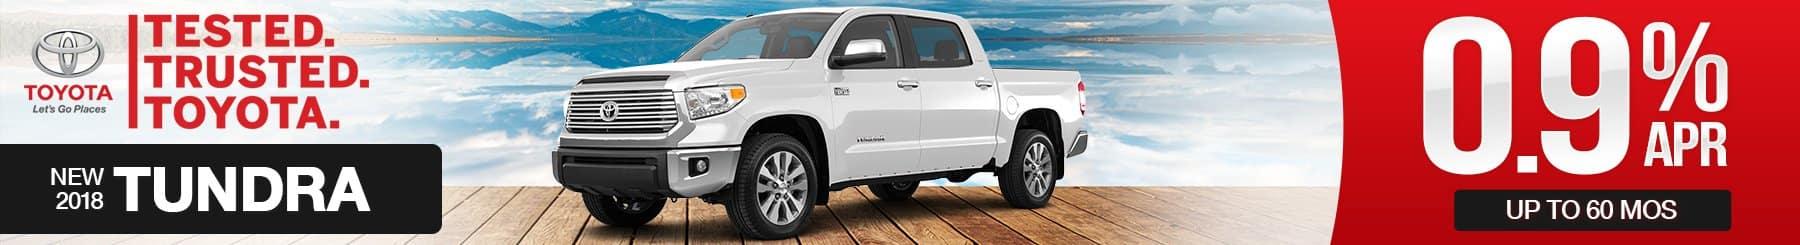 New 2018 Toyota Tundra Finance Special